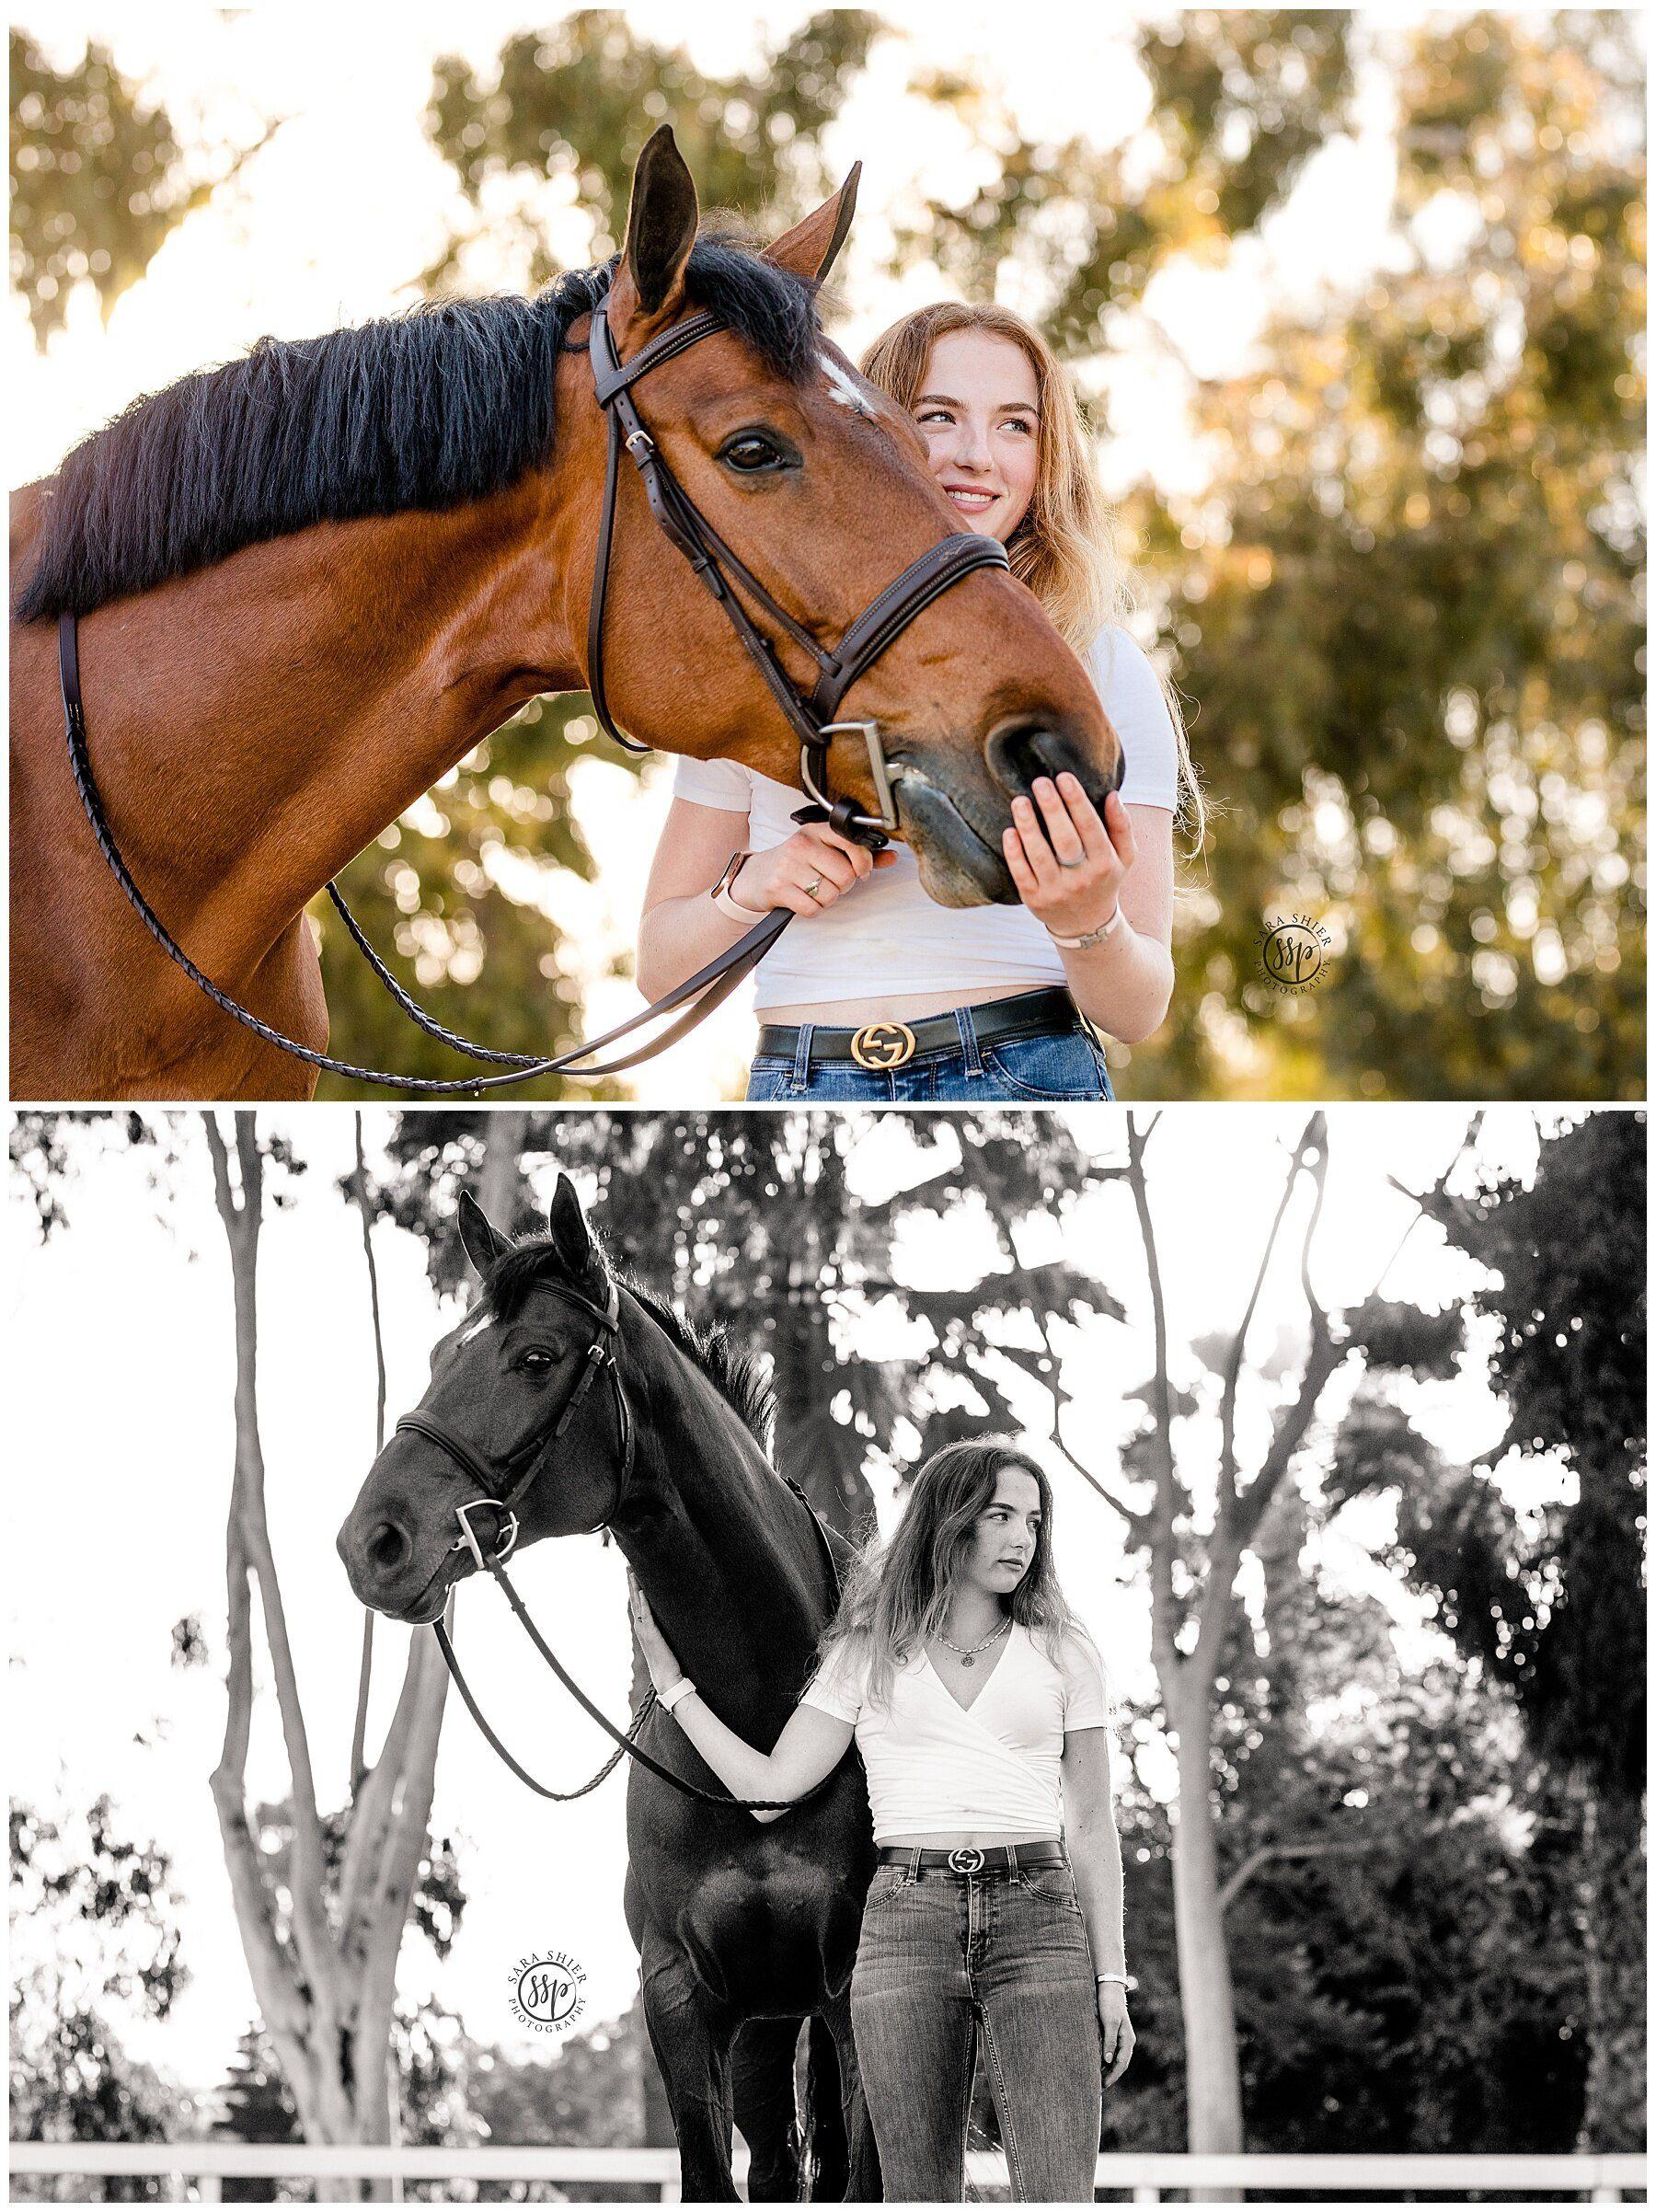 Black Background Horse Rider Equine Photographer Southern California Sara Shier Photogra Huntington Beach California Horse Photoshoot Ideas Equine Photographer